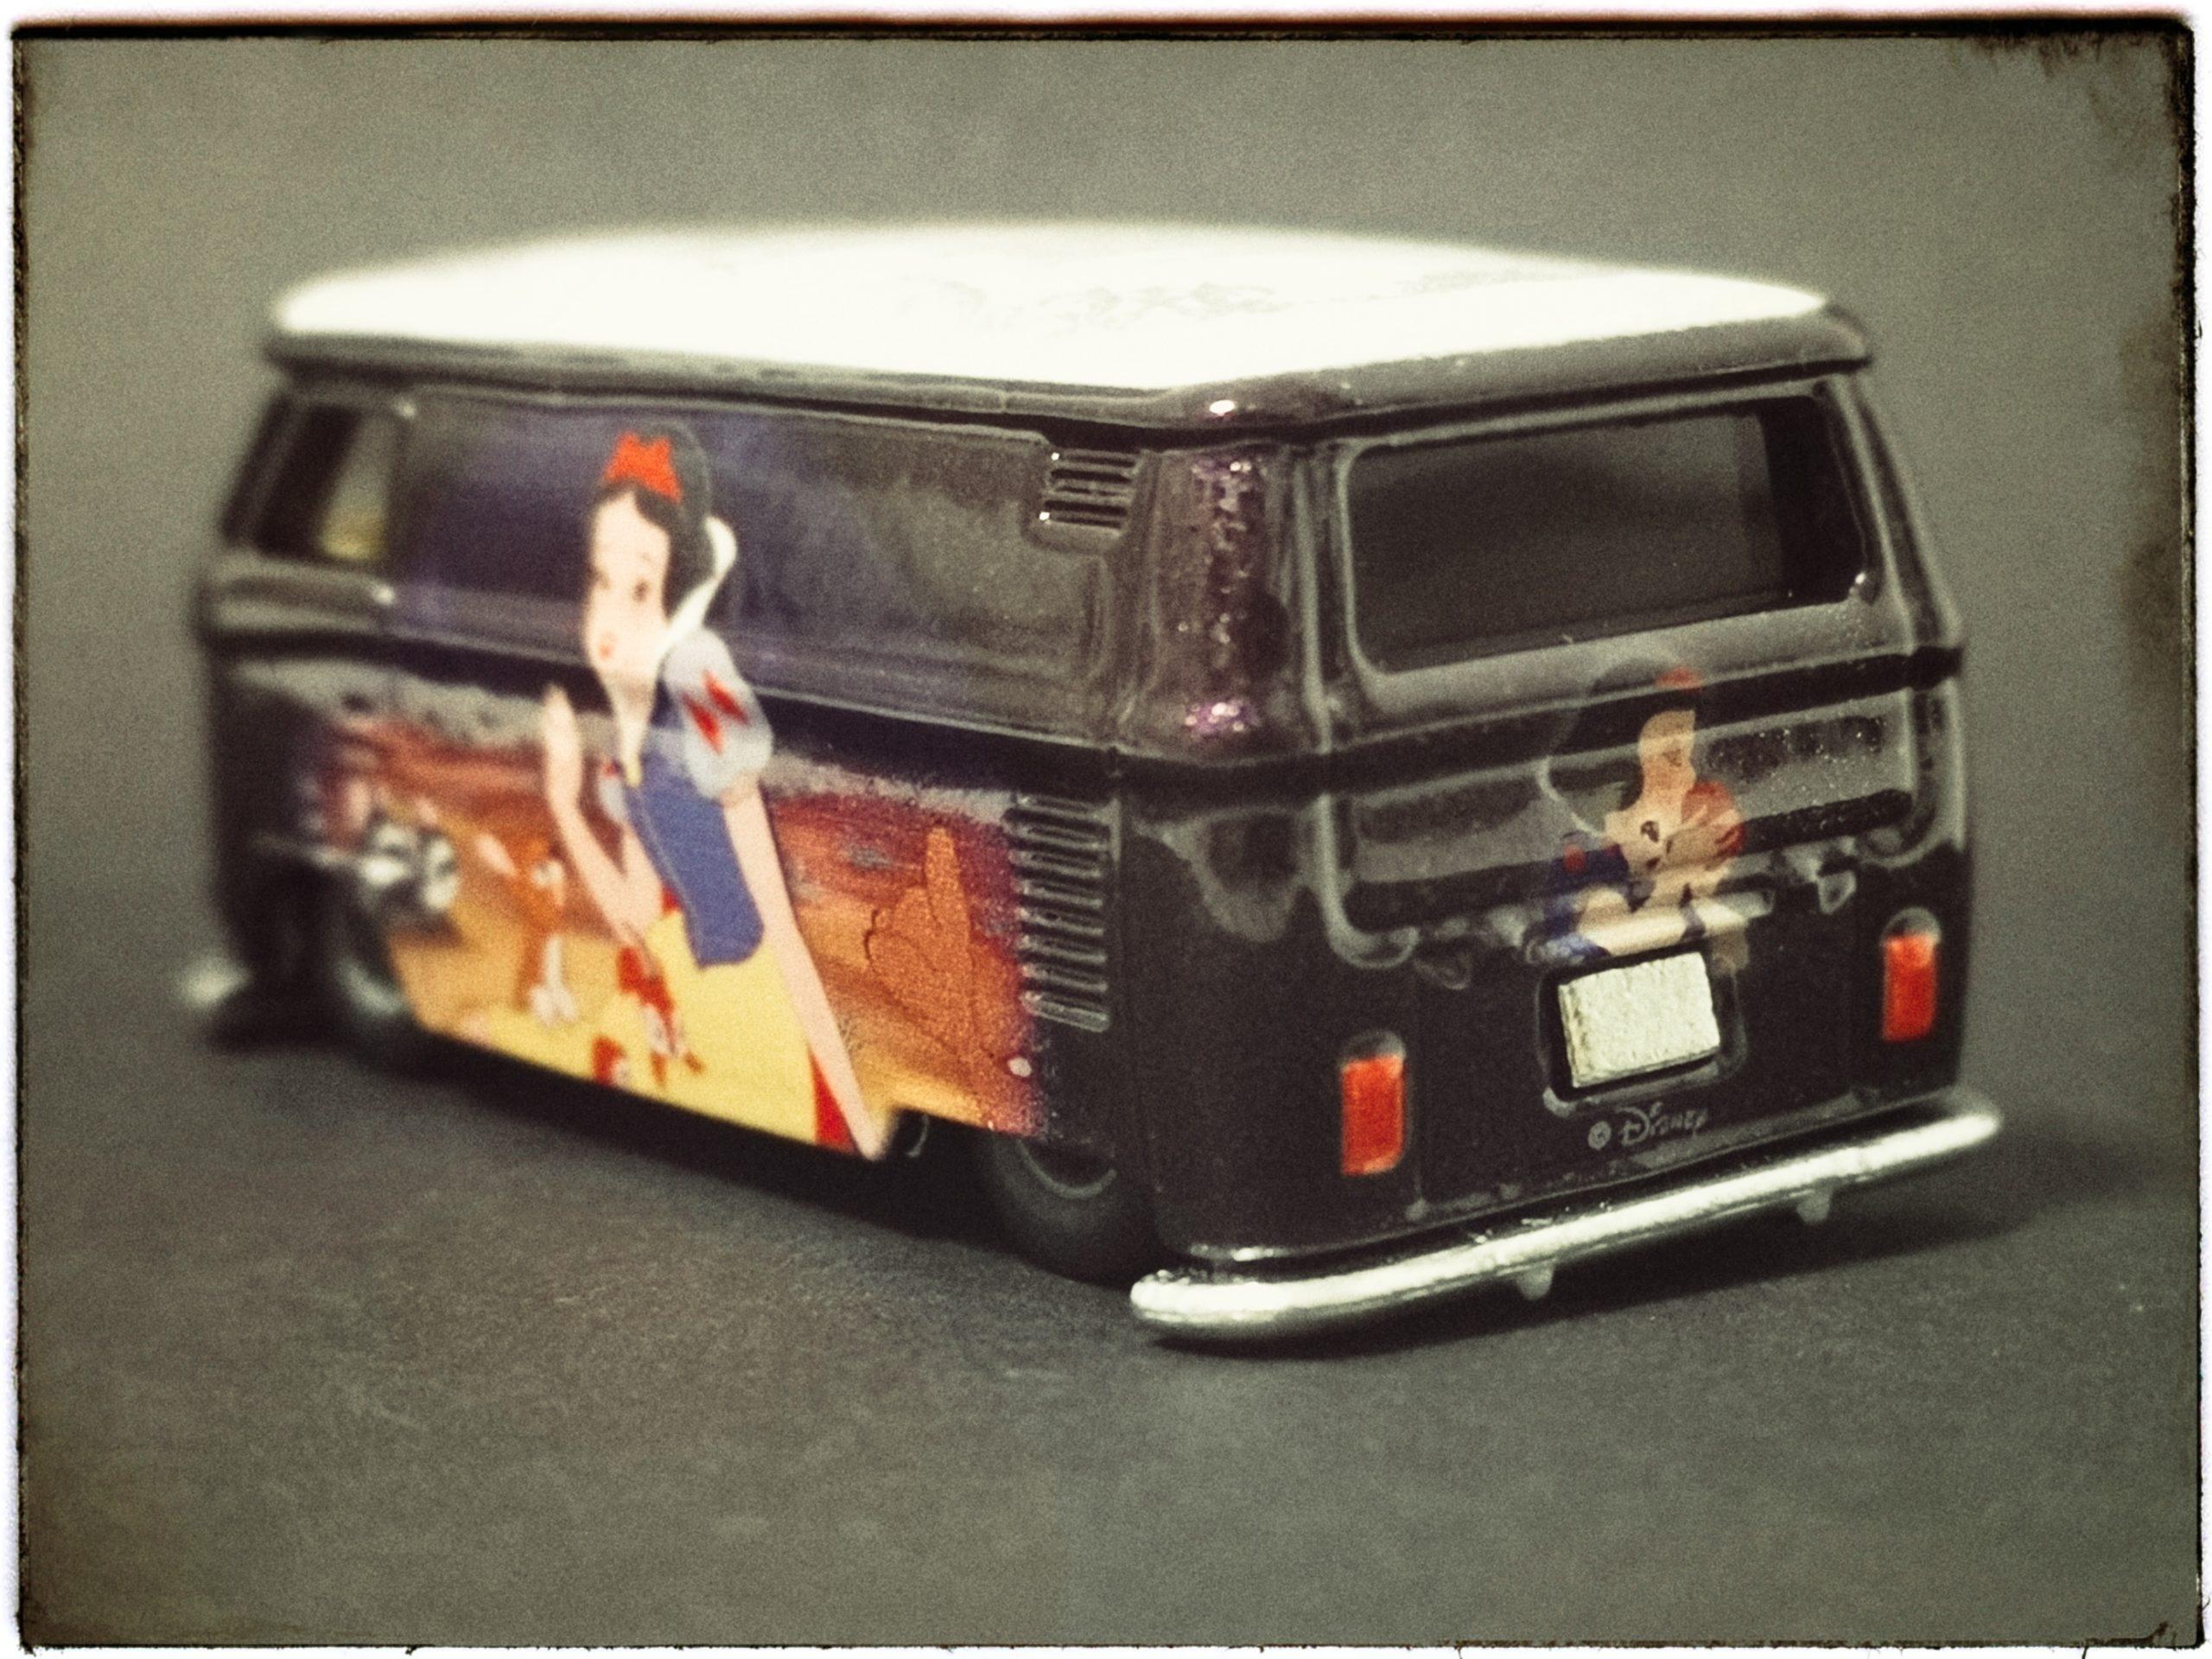 Hot Wheels Volkswagen T1 Panel Bus (FKY34) 2018 Pop Culture: Disney Snow White (1/5) metallic purple VW back angle